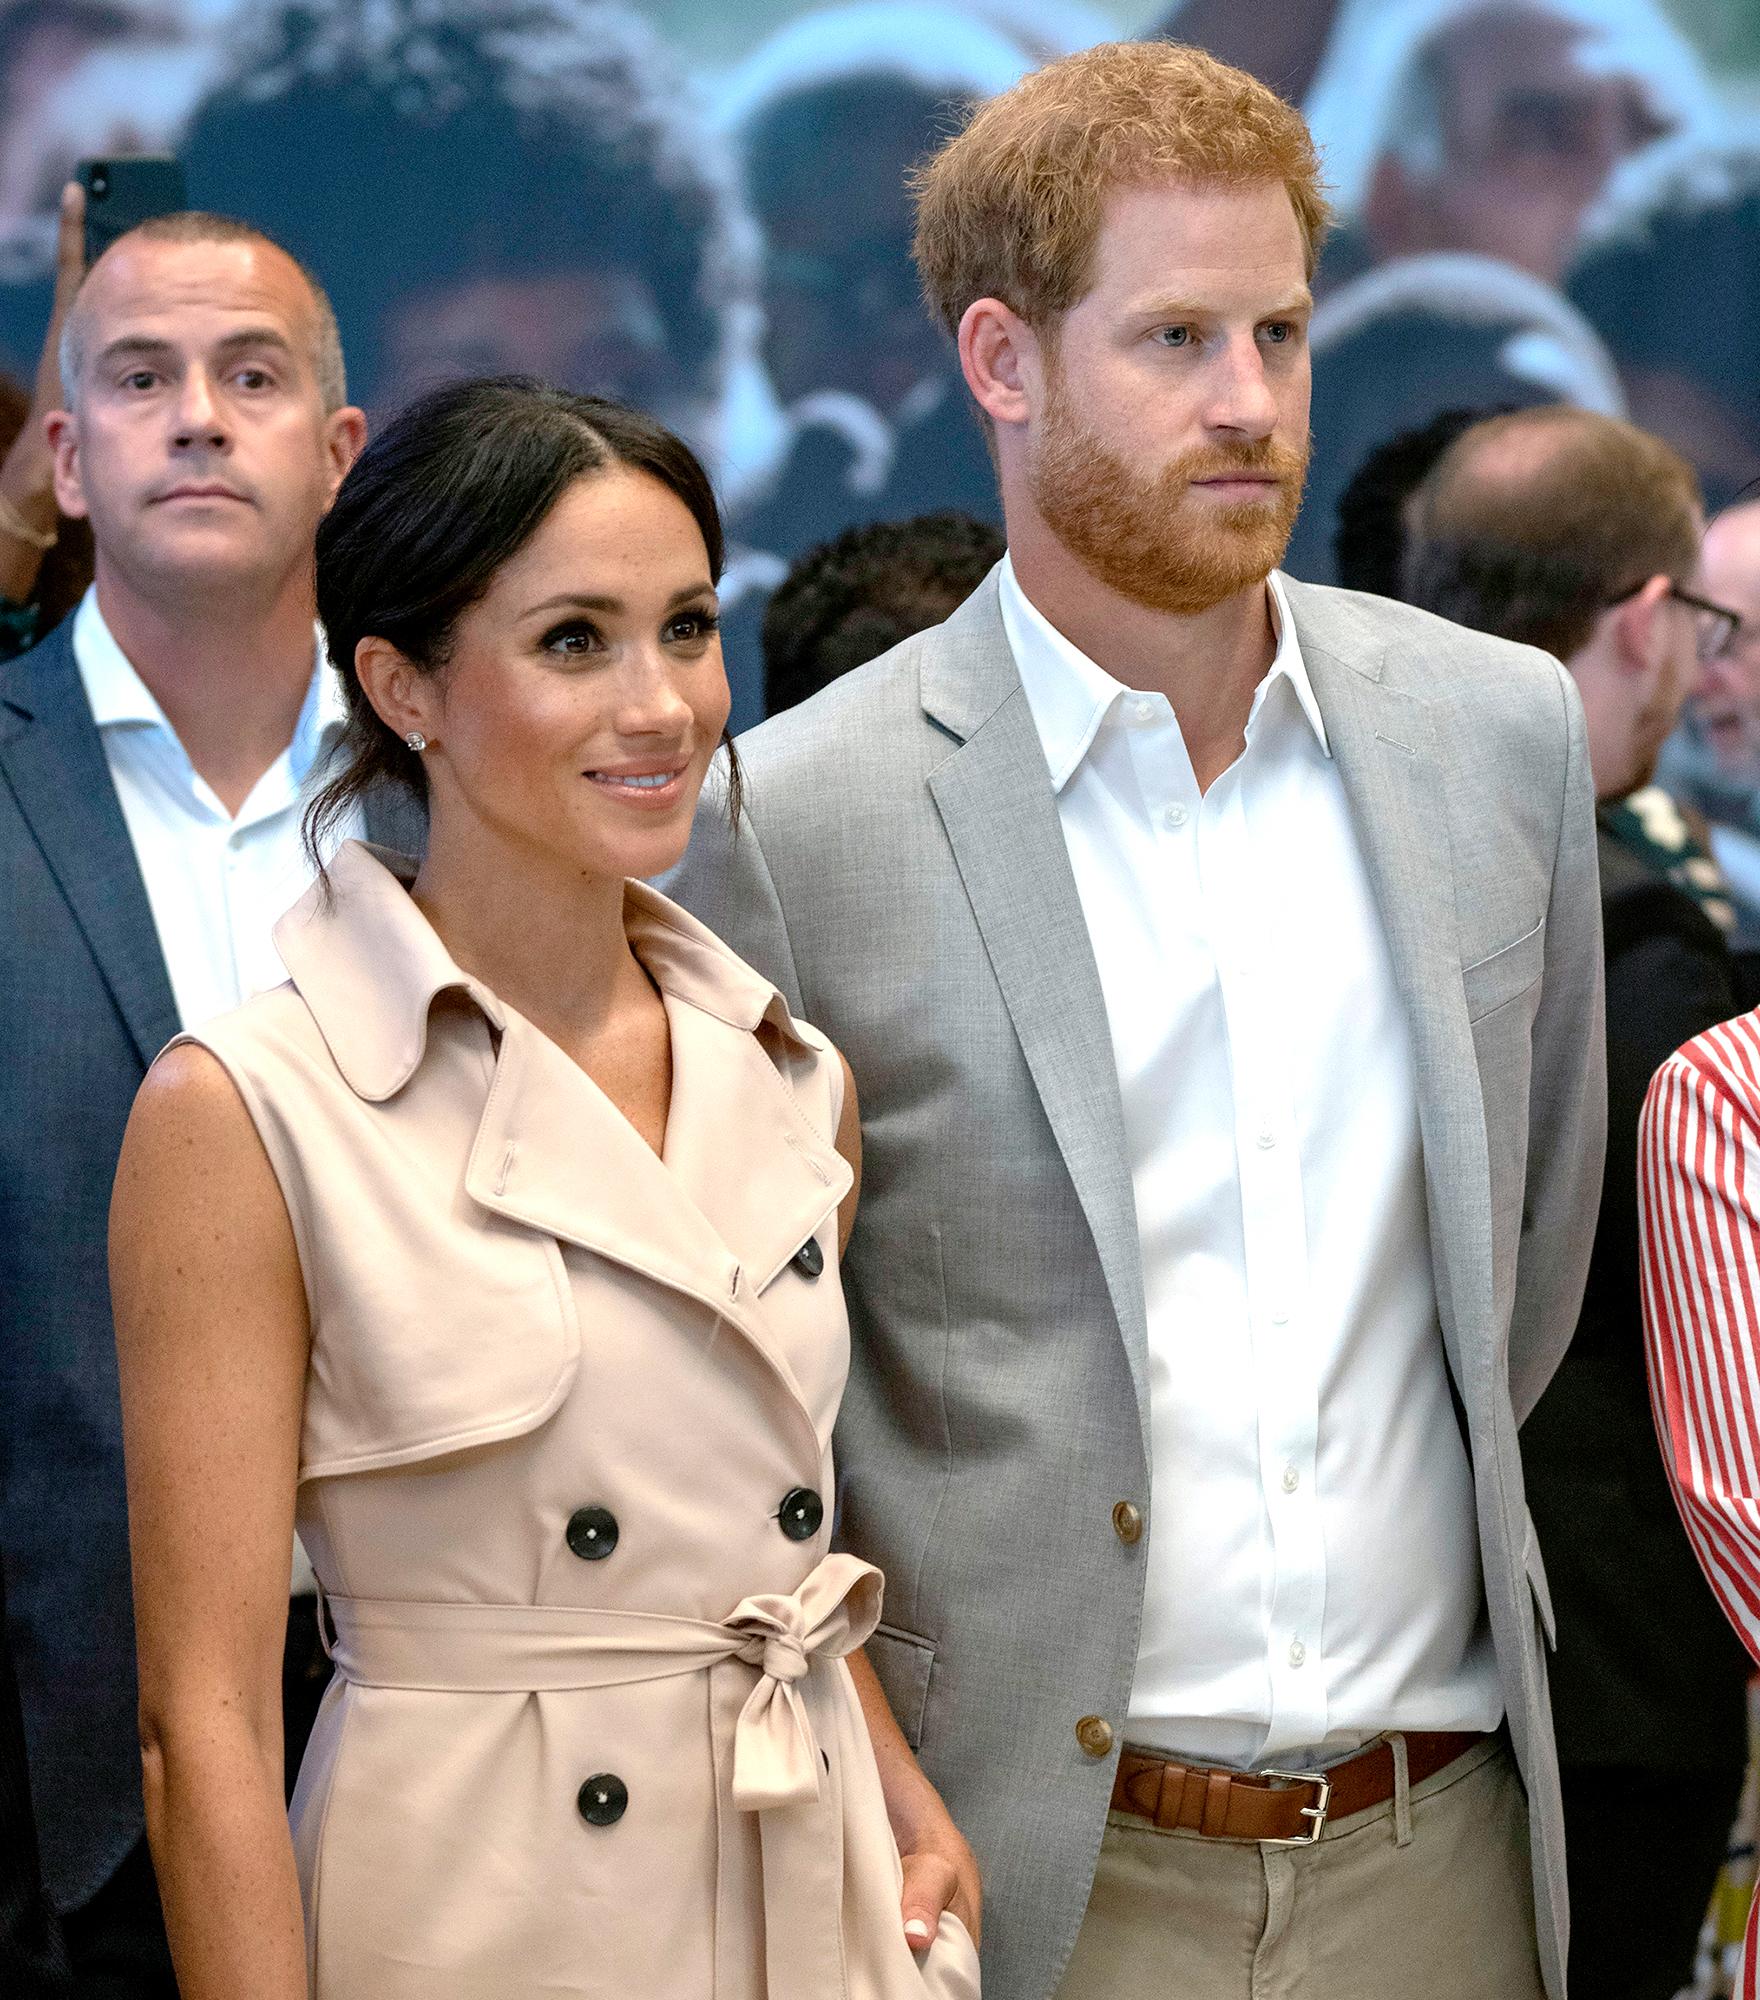 Duchess-Meghan-Returns-to-Canada,-Prince-Harry-Stays-in-U.K.-Amid-Drama